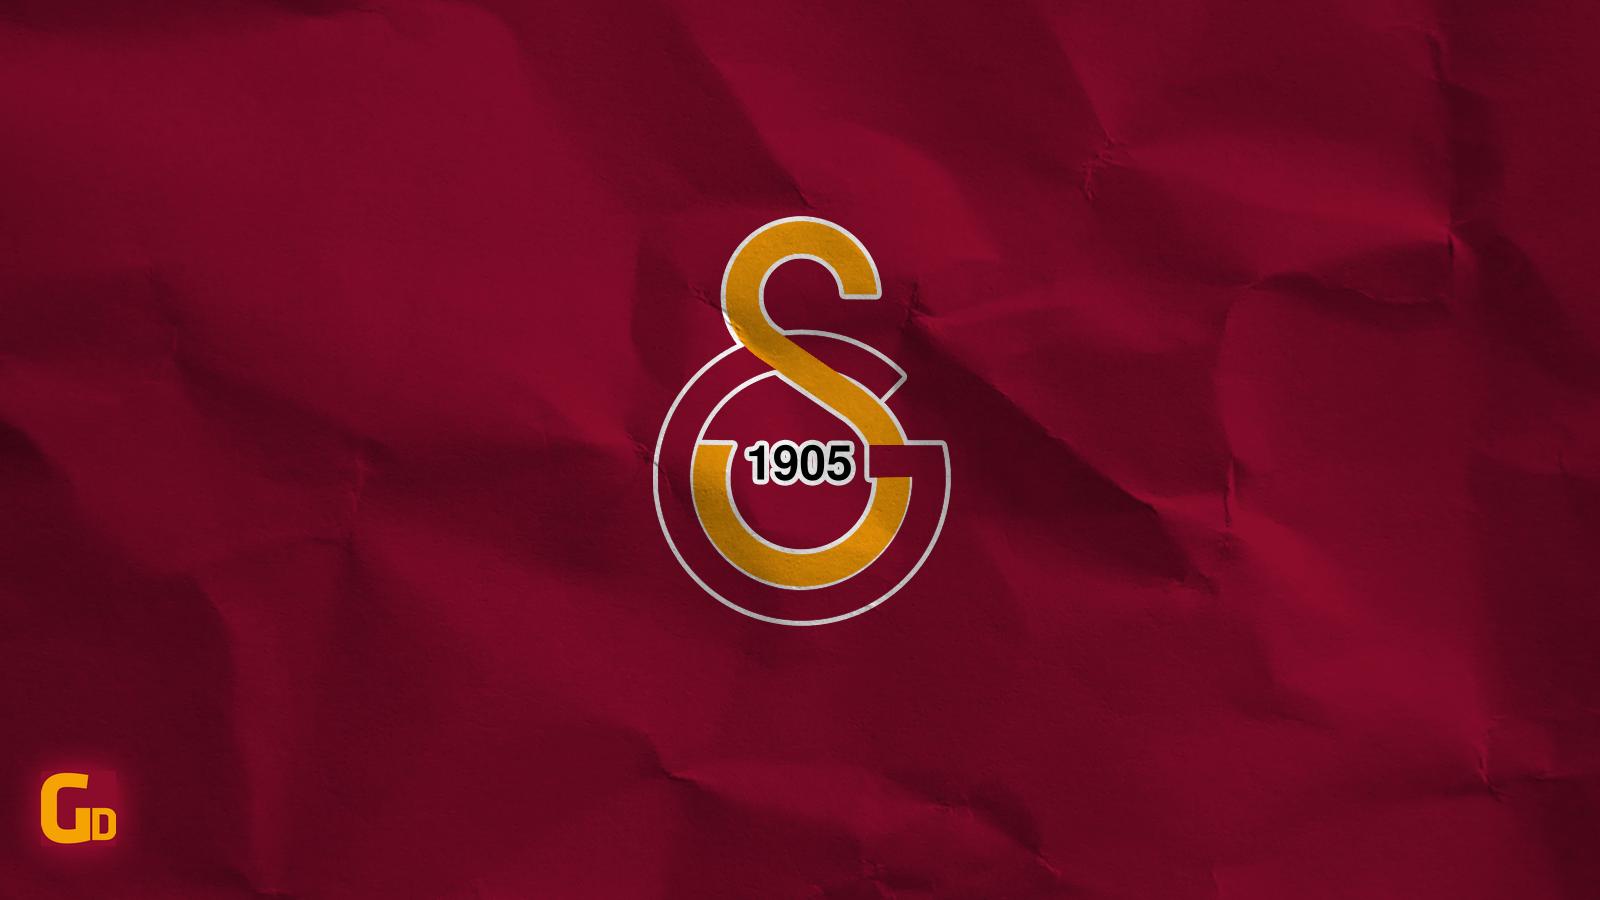 Killzone Shadow Fall Wallpaper En G 252 Zel Galatasaray Hd Resimleri Galatasaray Hd